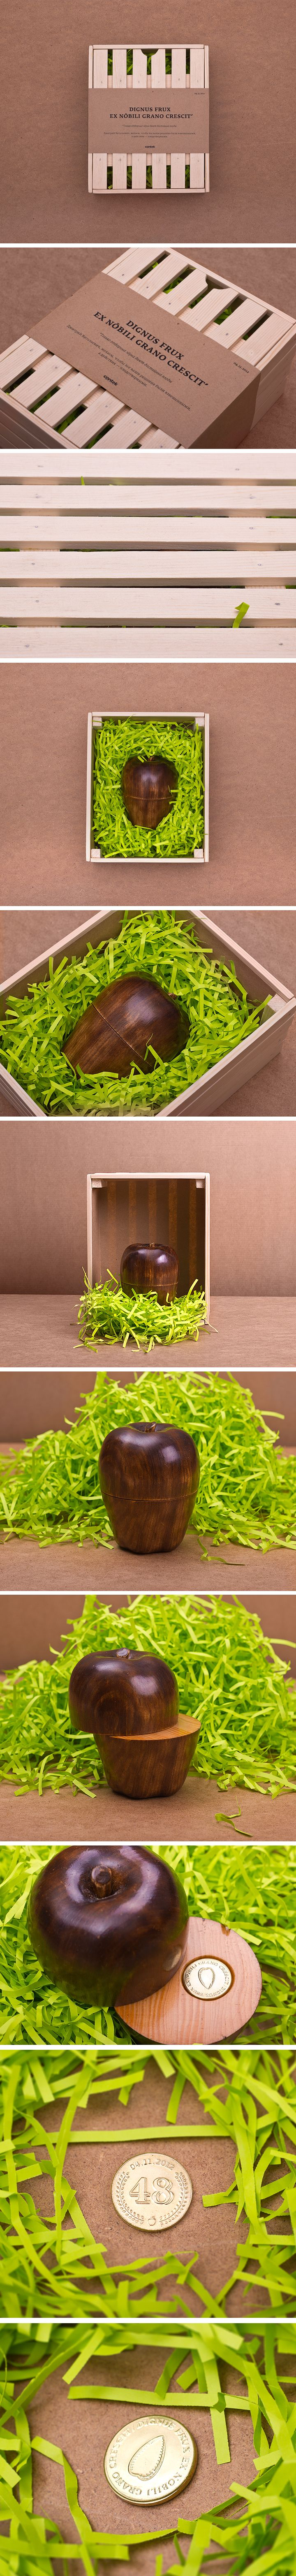 Отборное зерно  Хэндмейд © province. One of my personal faves. interesting #packaging #design